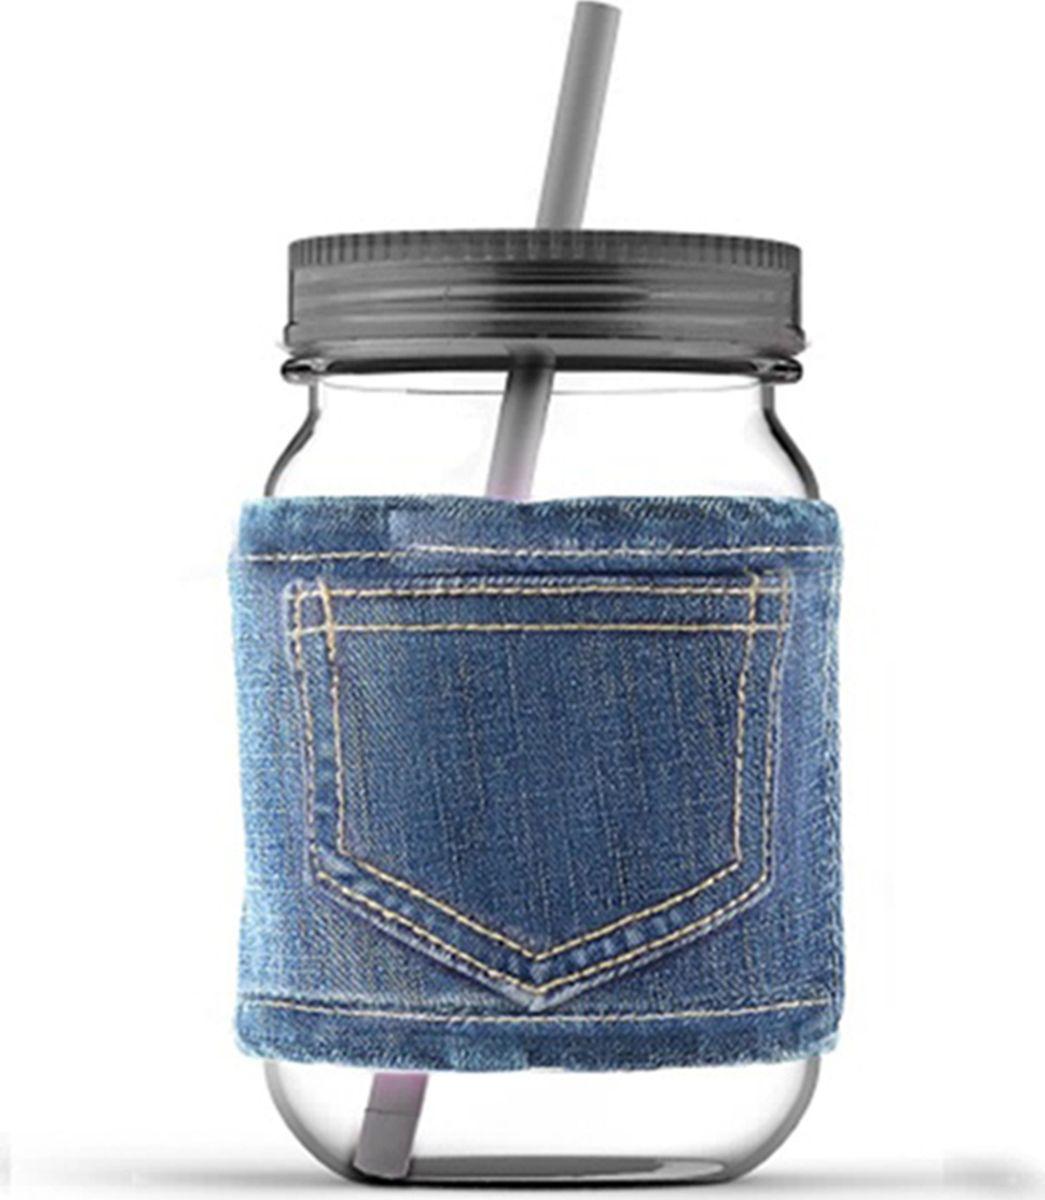 Кружка Asobu Jeans jar, цвет: серый, 750 мл бутылка asobu ice t 2 go цвет фиолетовый 400 мл